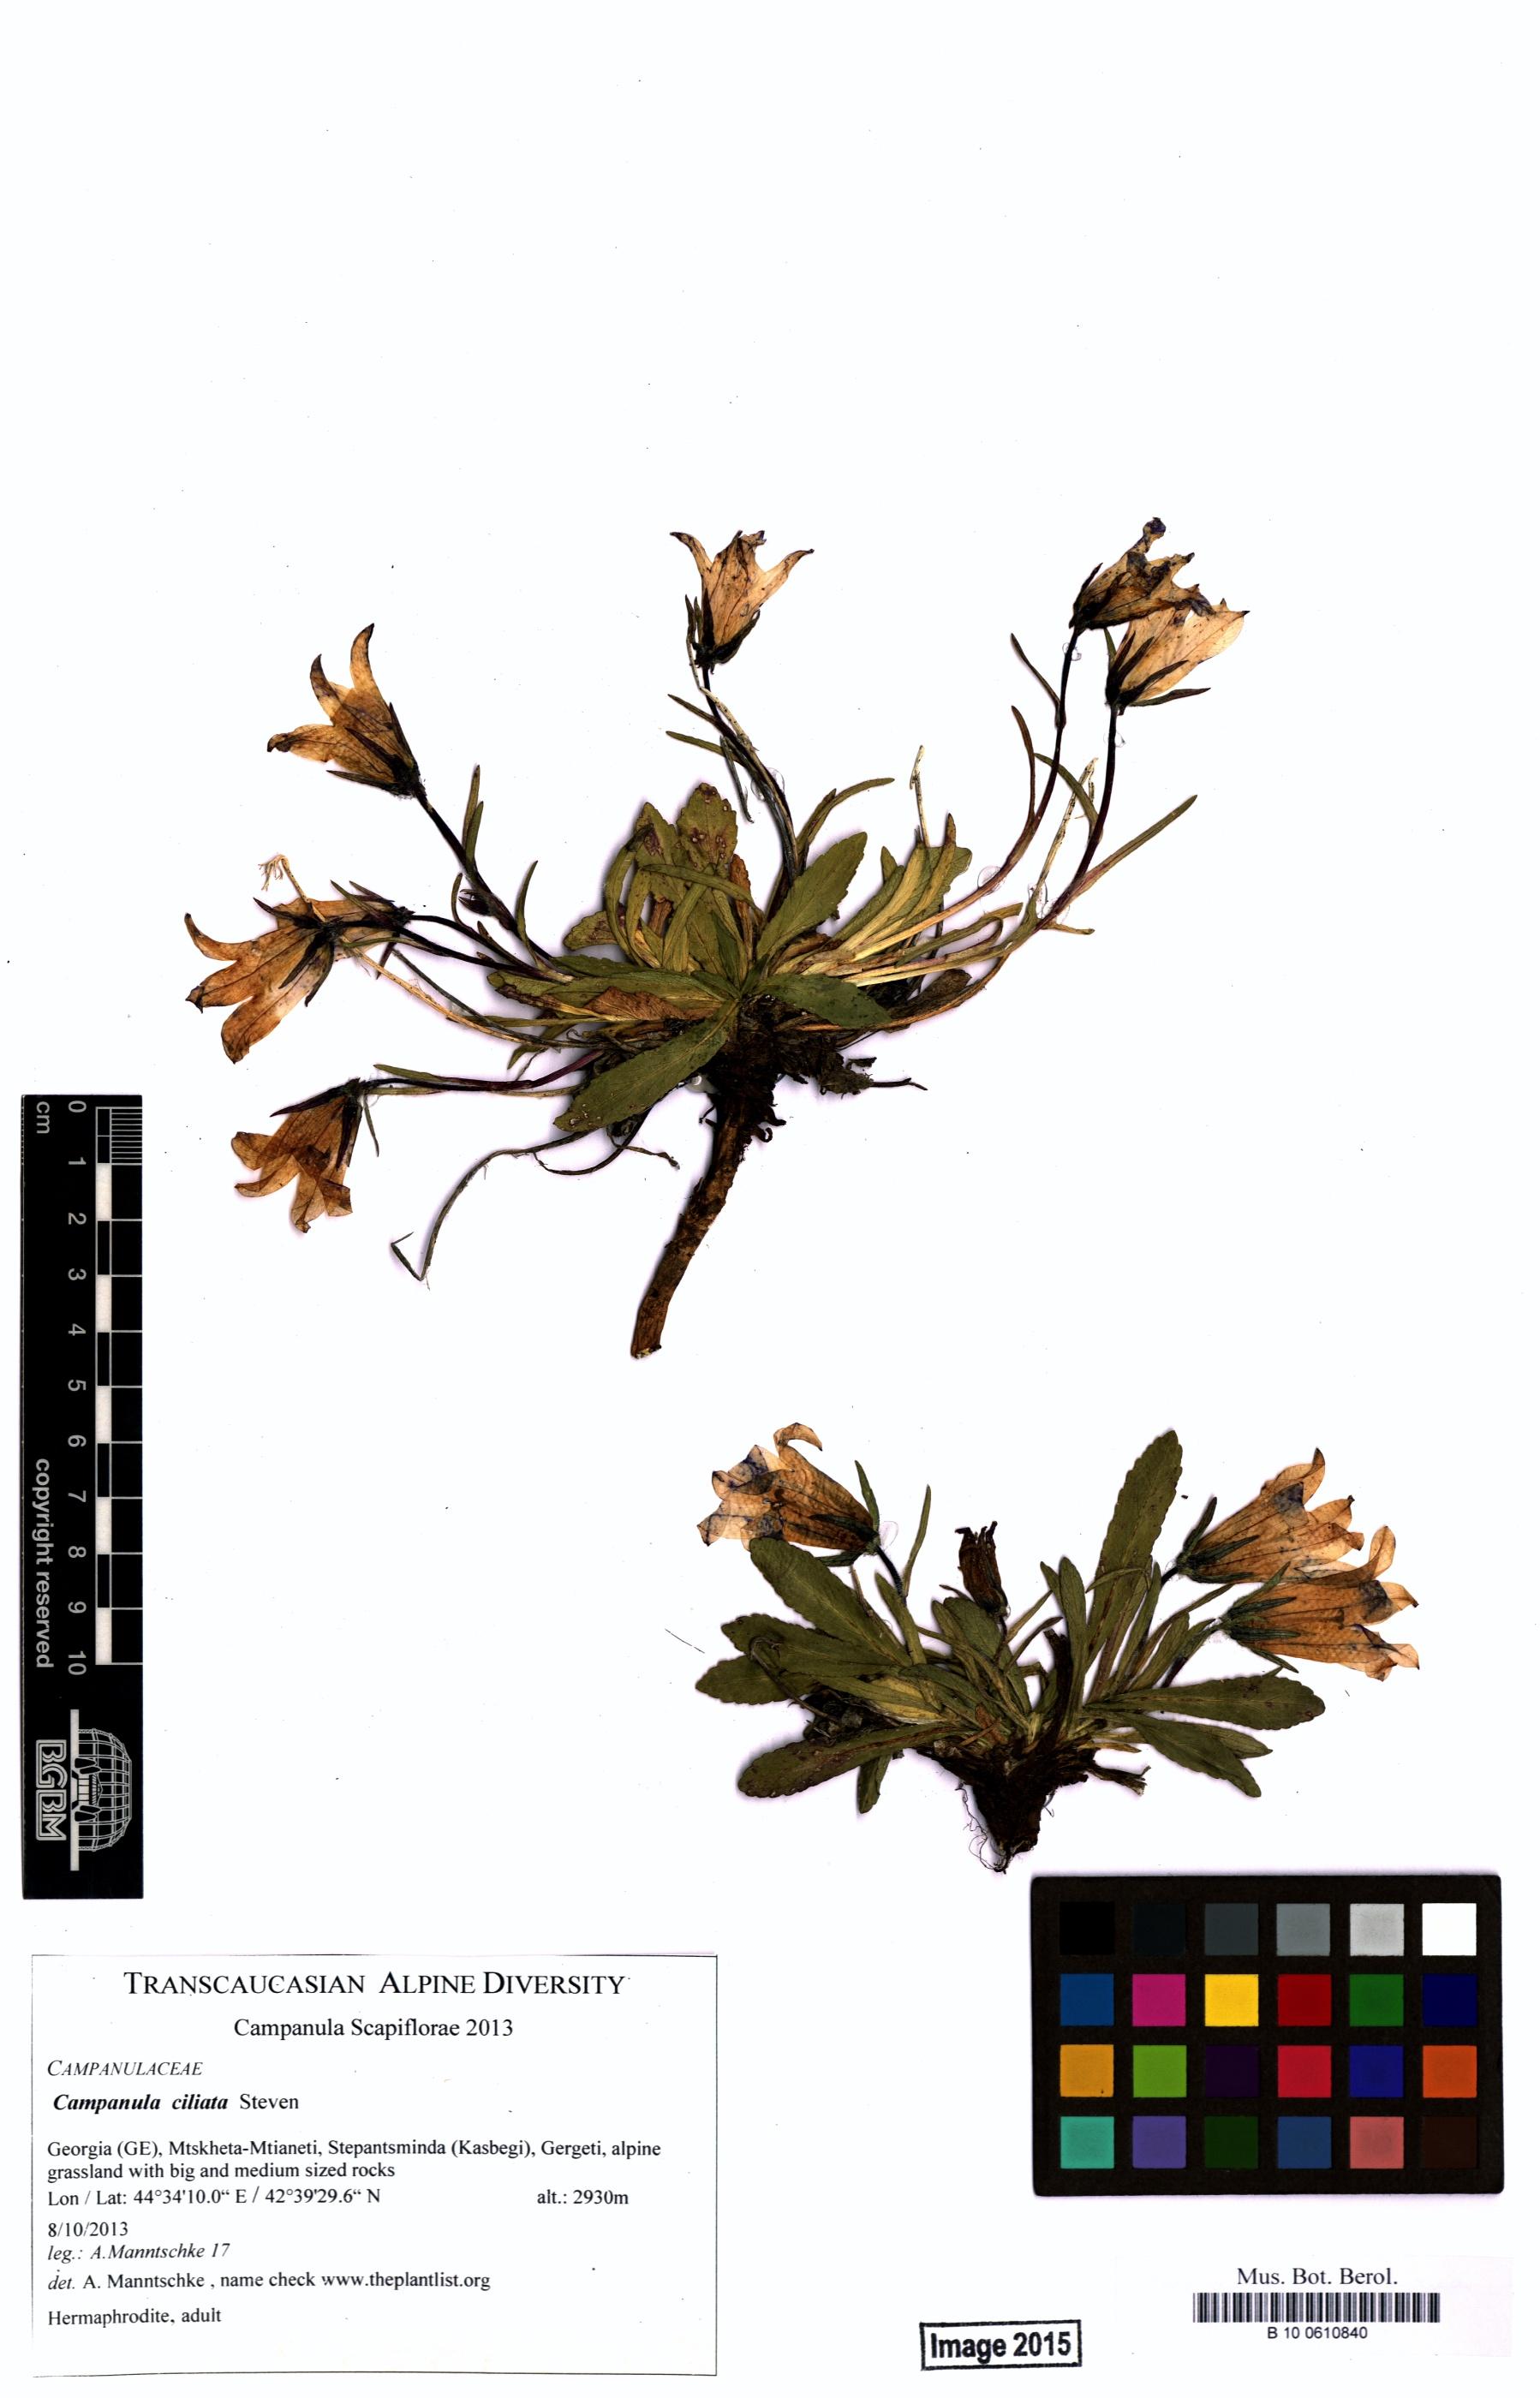 http://ww2.bgbm.org/herbarium/images/B/10/06/10/84/B_10_0610840.jpg